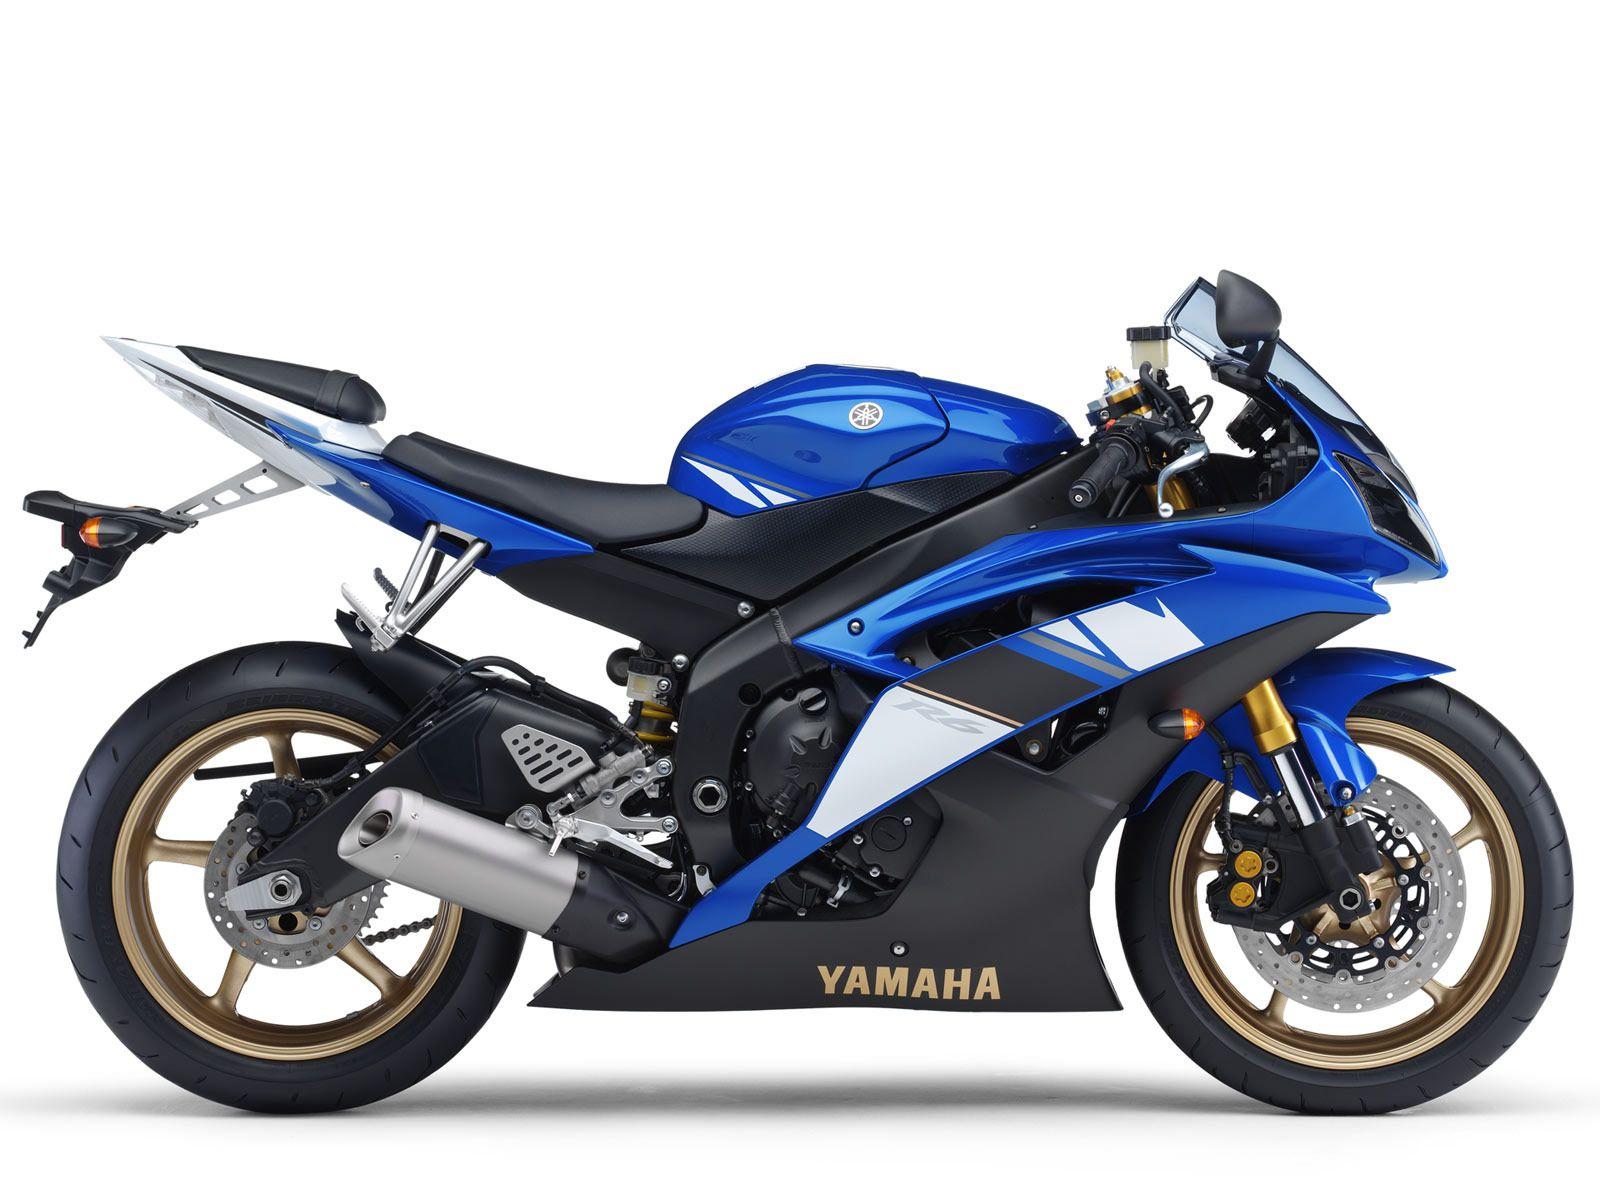 YAMAHA YZF-R6 - 2008 Yamaha Blue | YAMAHA YZF-R6 - 1999-2017 ...